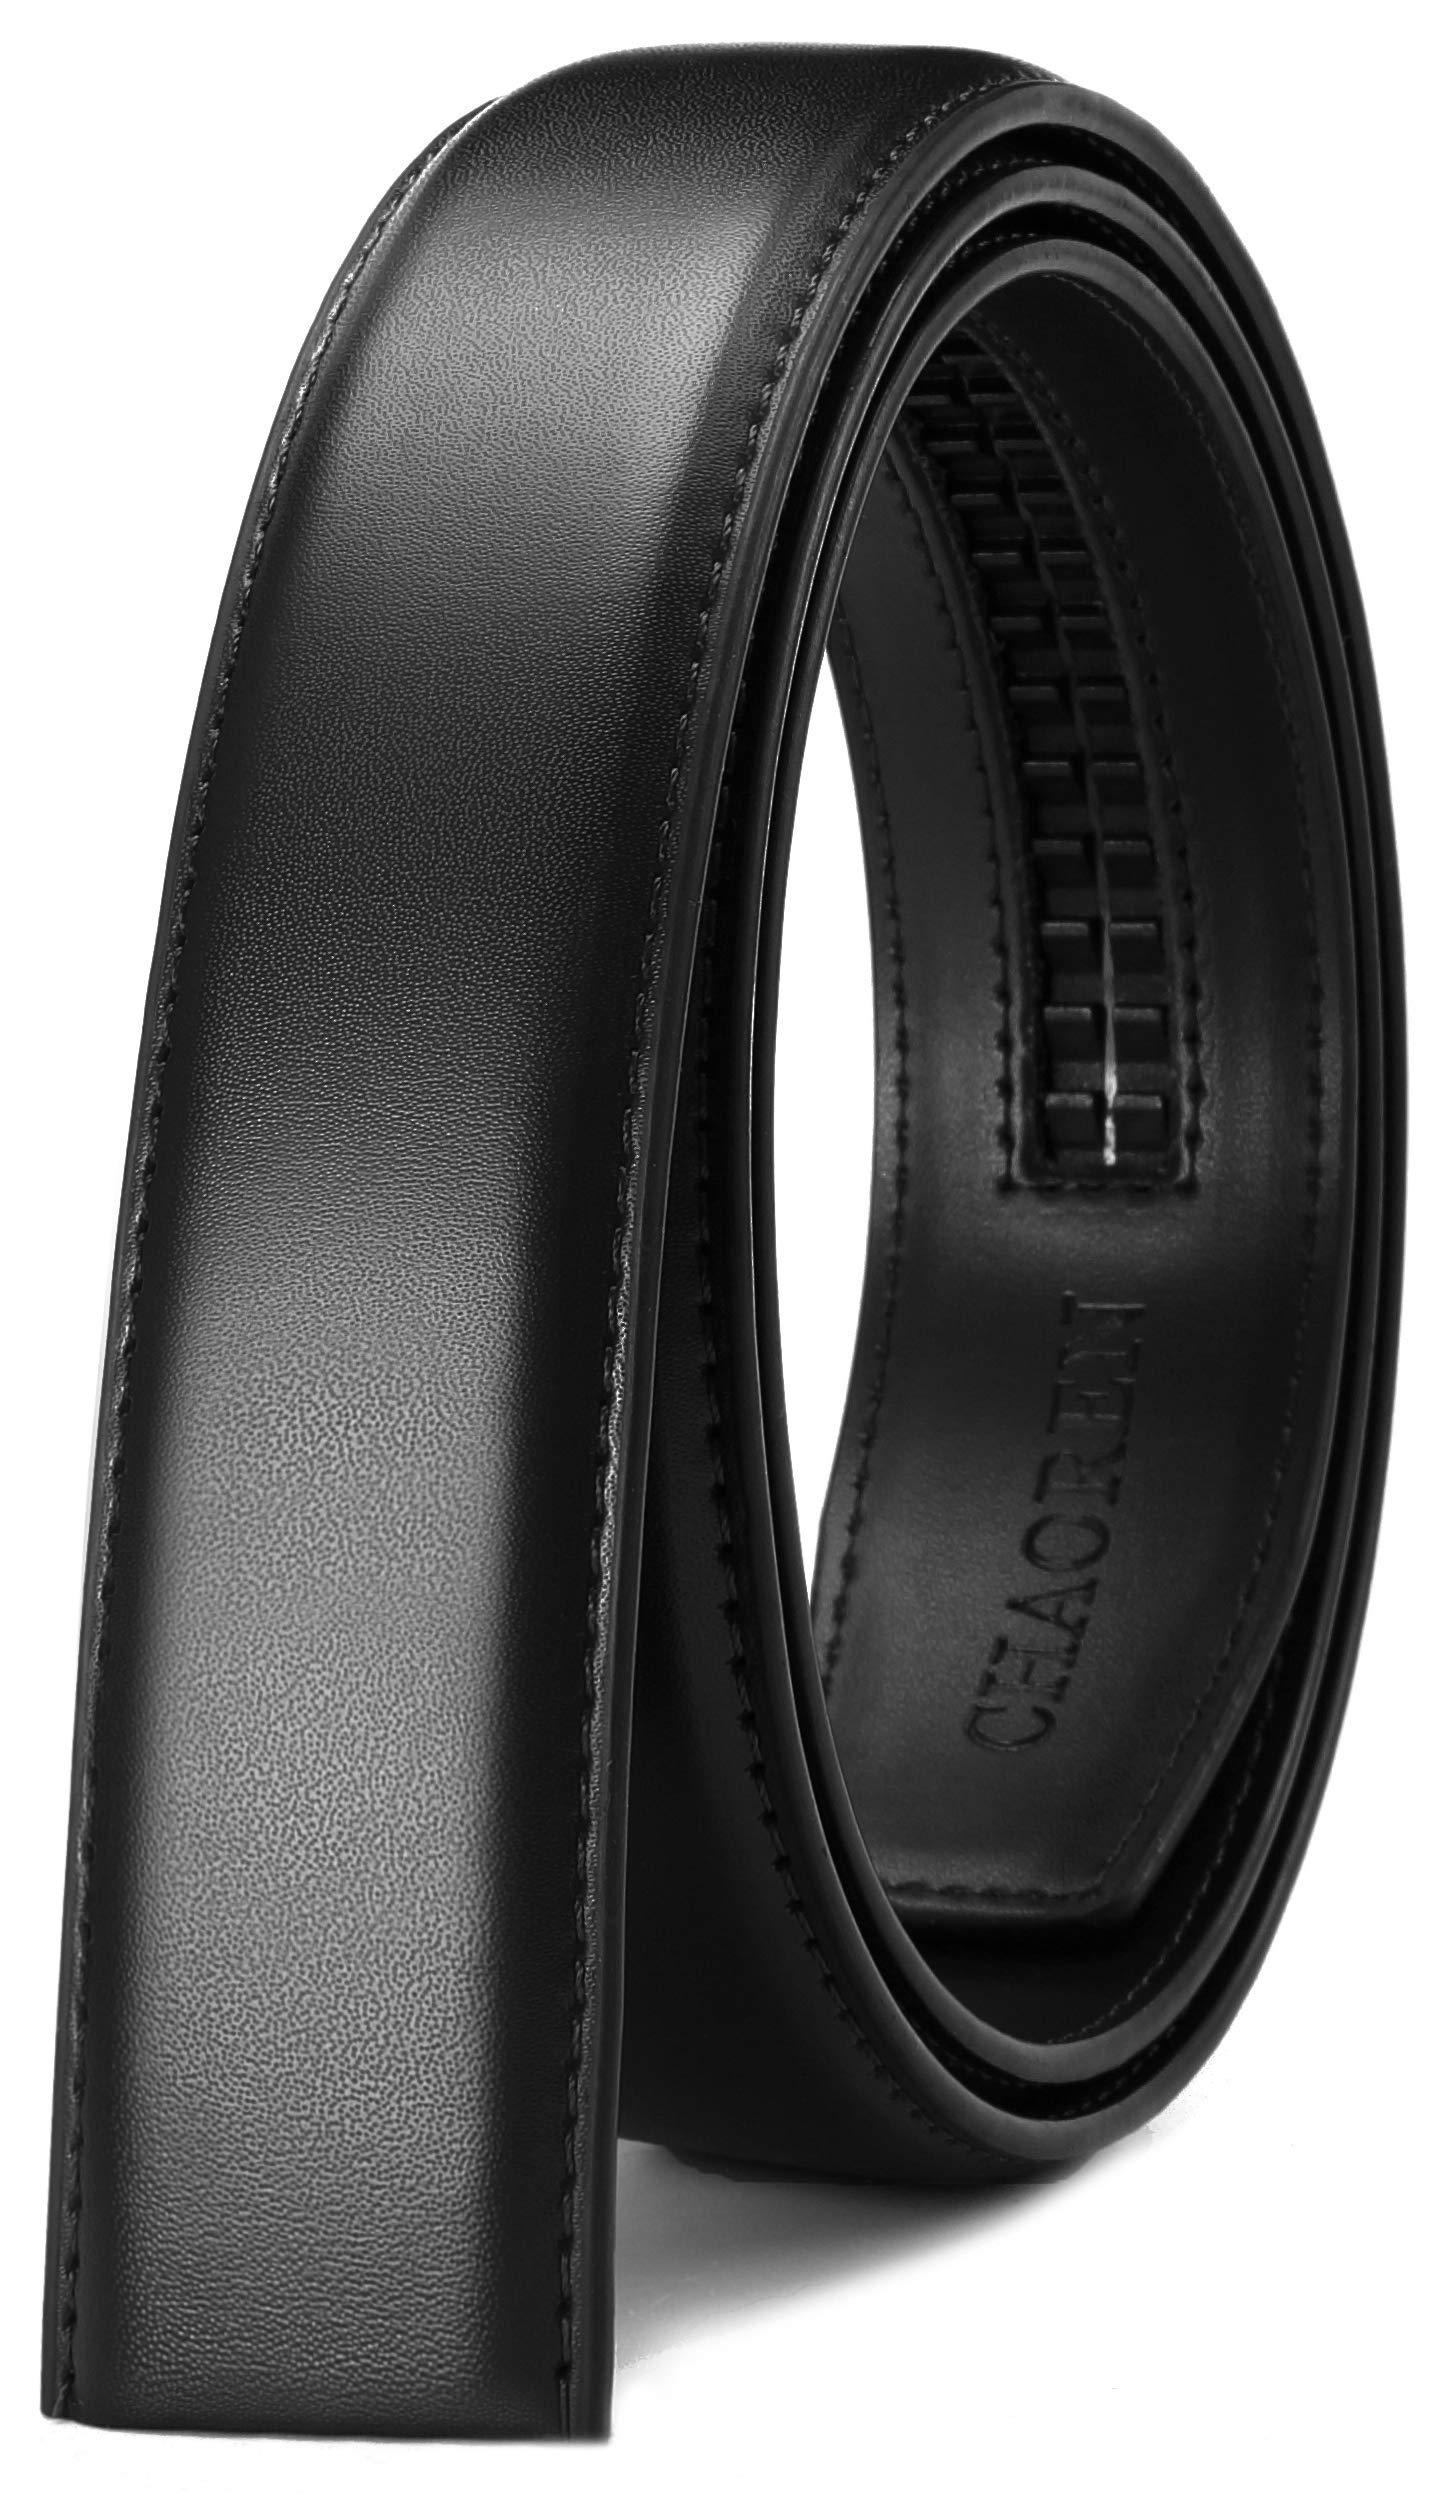 40mm Click Belt Buckle Only for 1 3//8 Ratchet Belt Strap CHAOREN Automatic Slide Buckle Adjustable